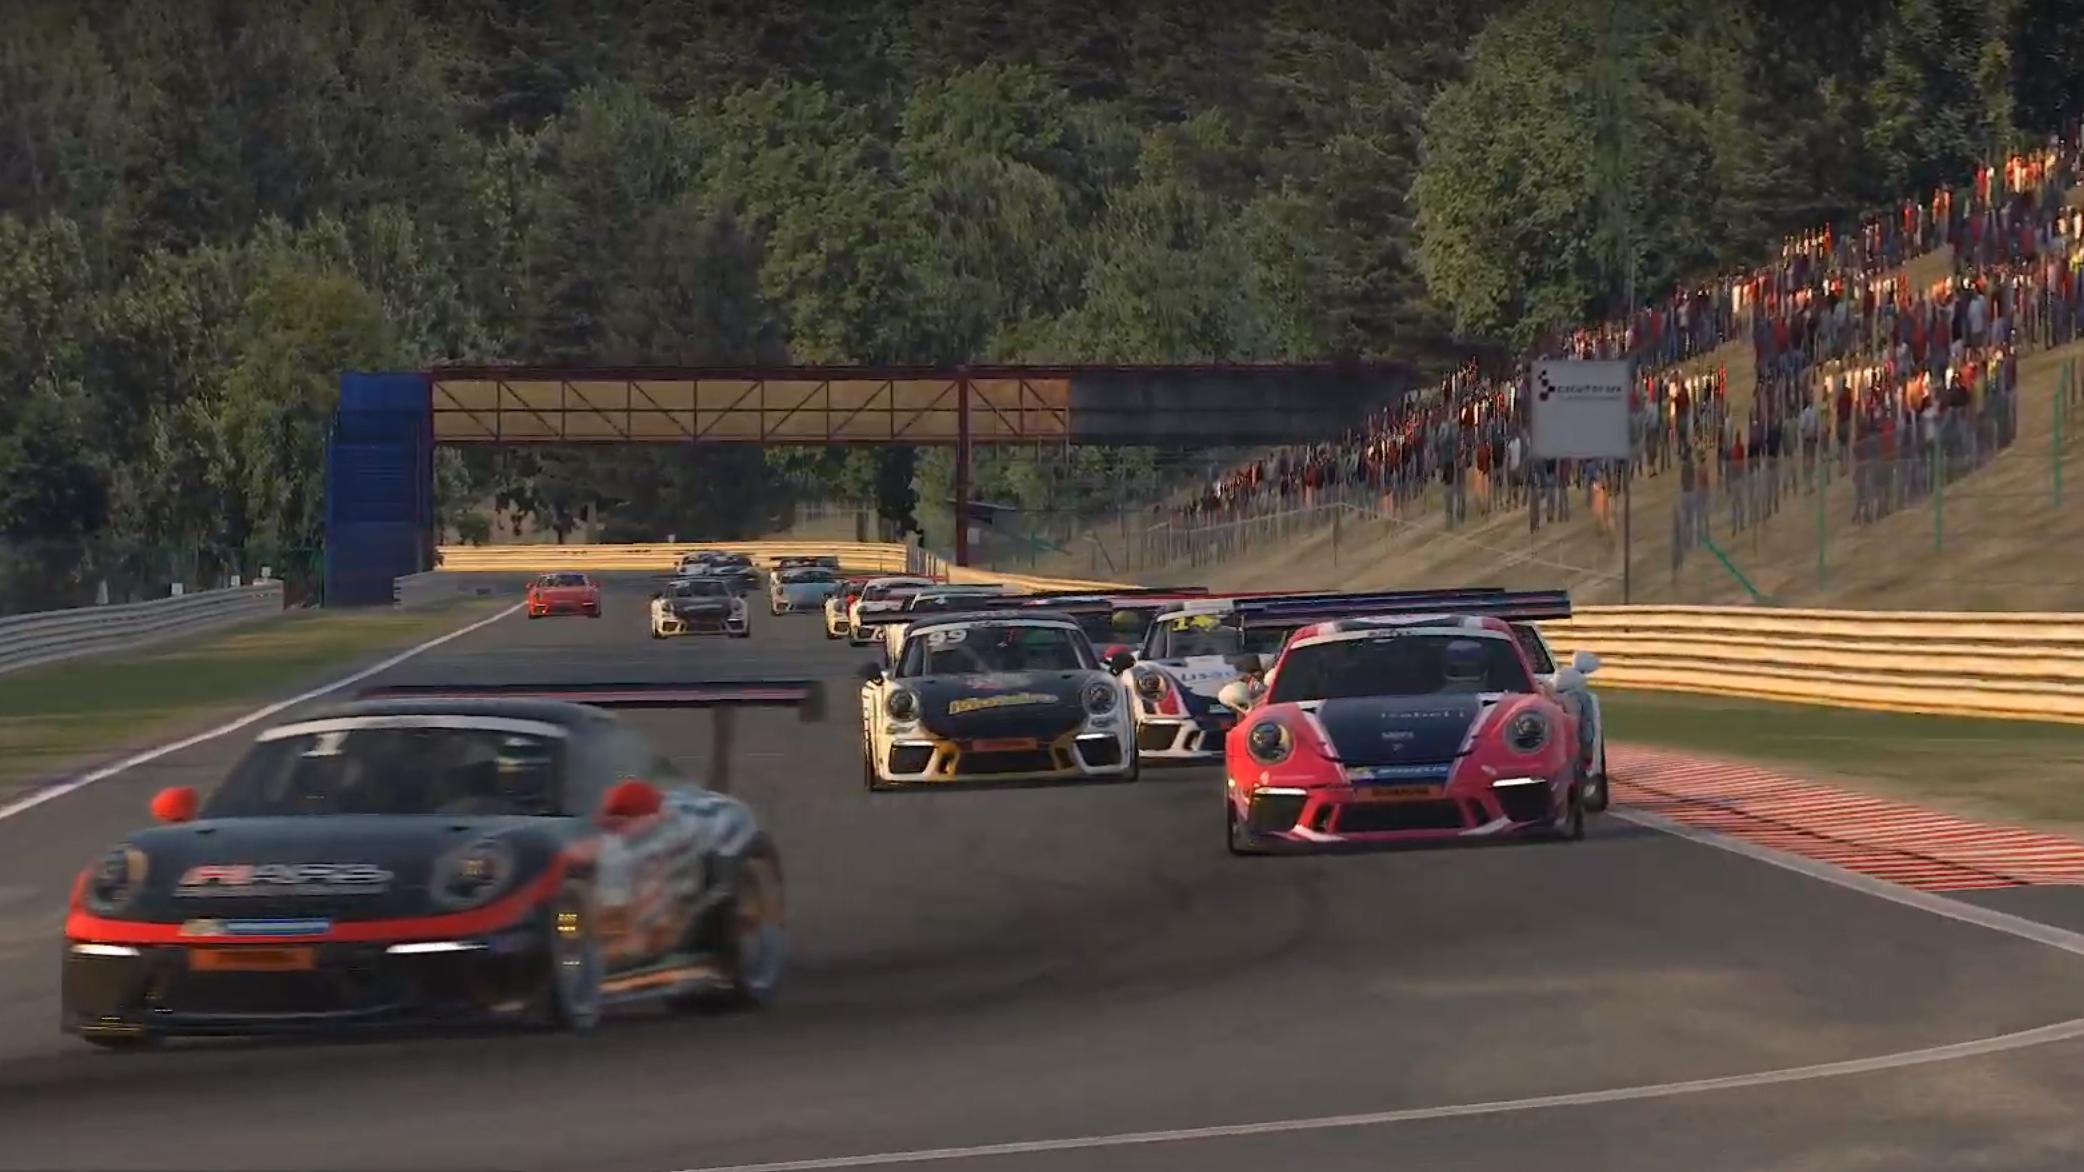 Última etapa do Porsche eSports Carrera Cup Brasil acontece nesta quinta-feira em Interlagos